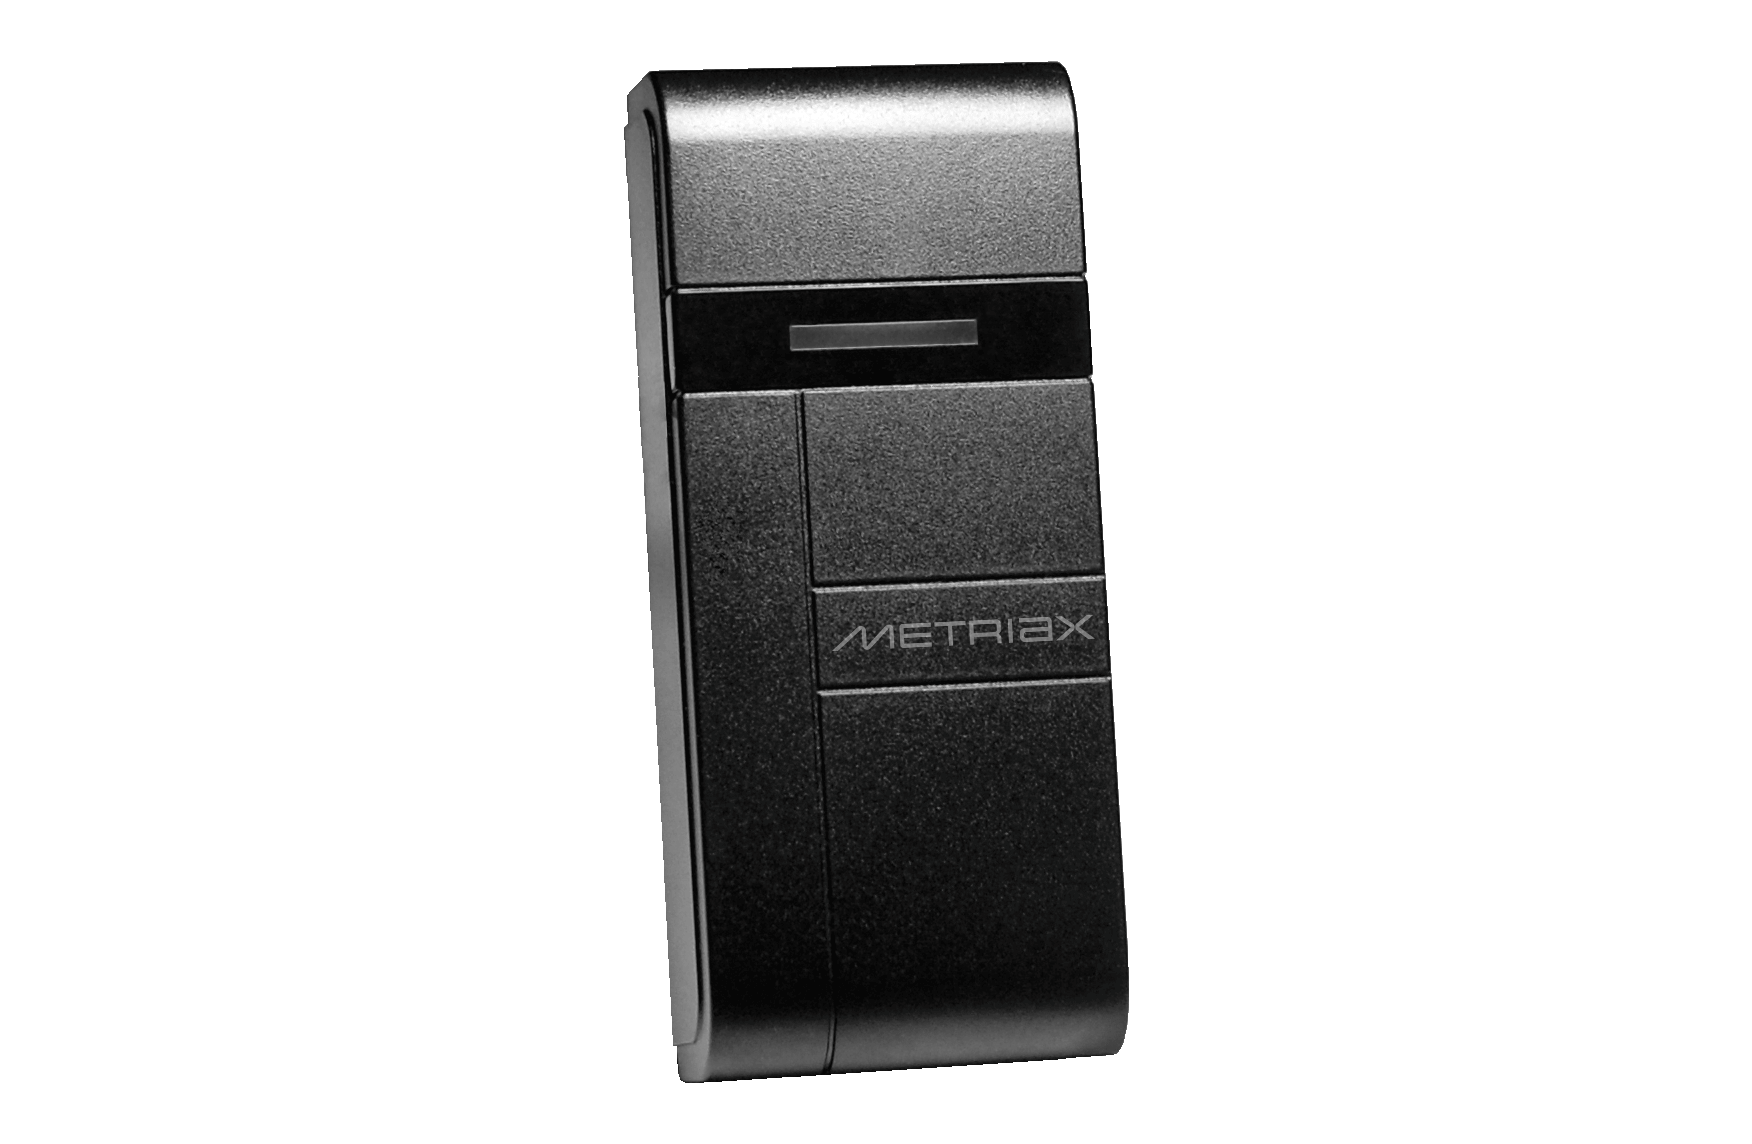 Metriax-MDE 950- RFID RS485 Modbus Reader-Ladecontroller-similar to Quio QDE-950-4-Wiegand Reader-RFID NFC